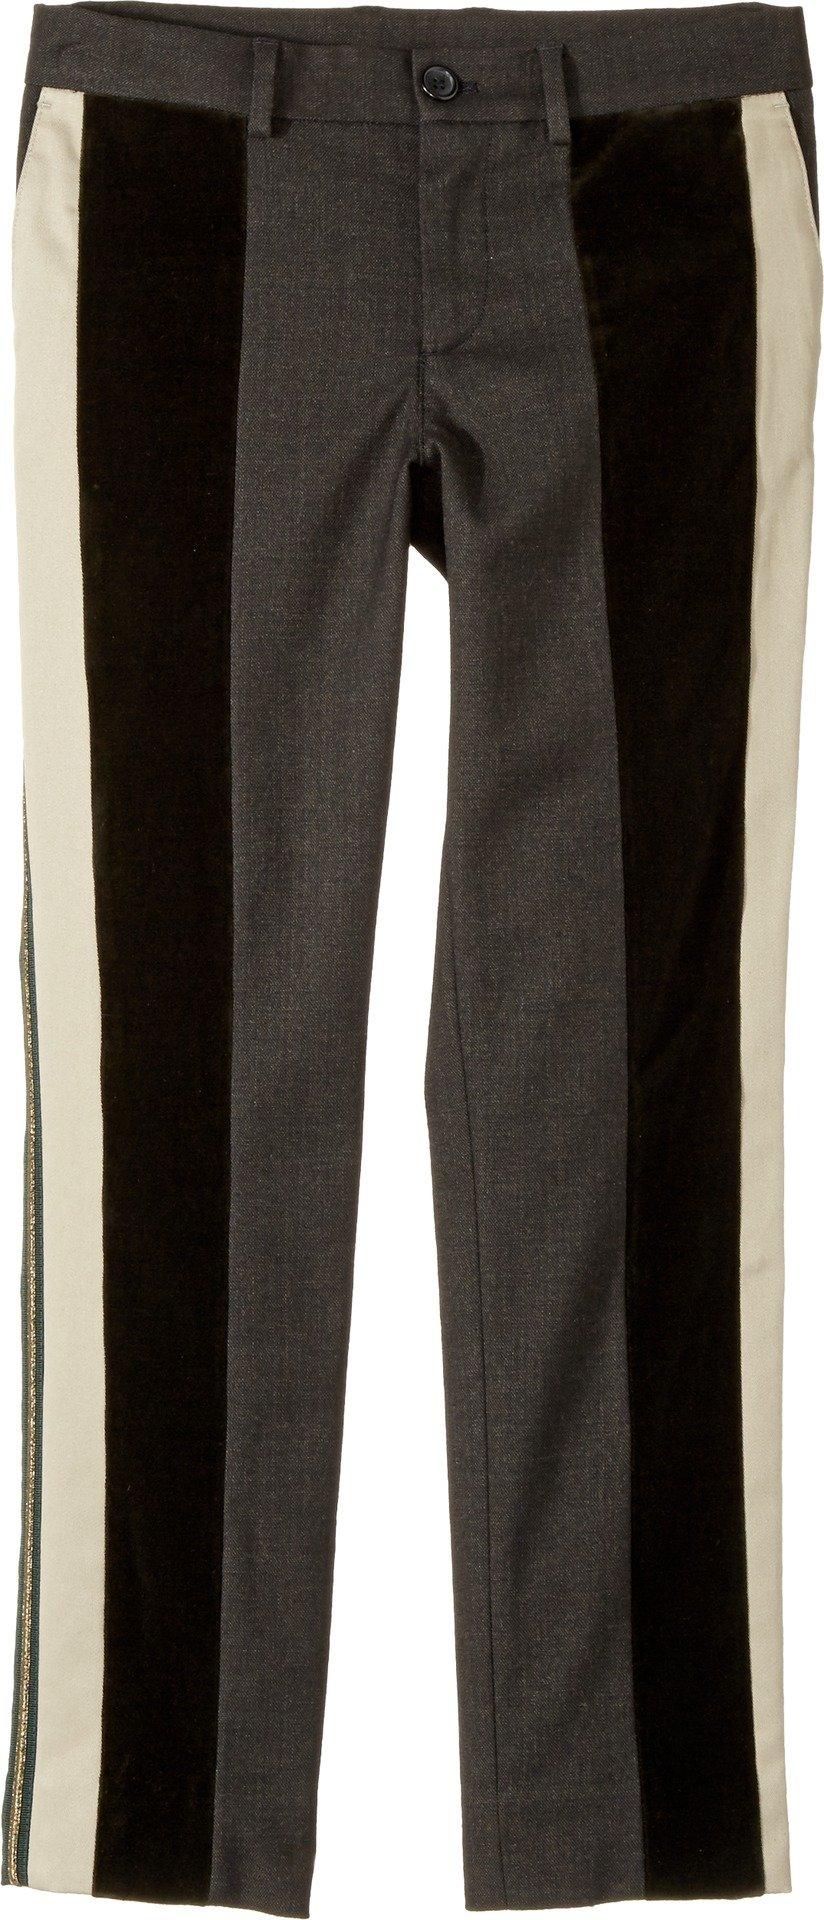 Dolce & Gabbana Kids Boy's Side Stripe Pants (Big Kids) Green 10